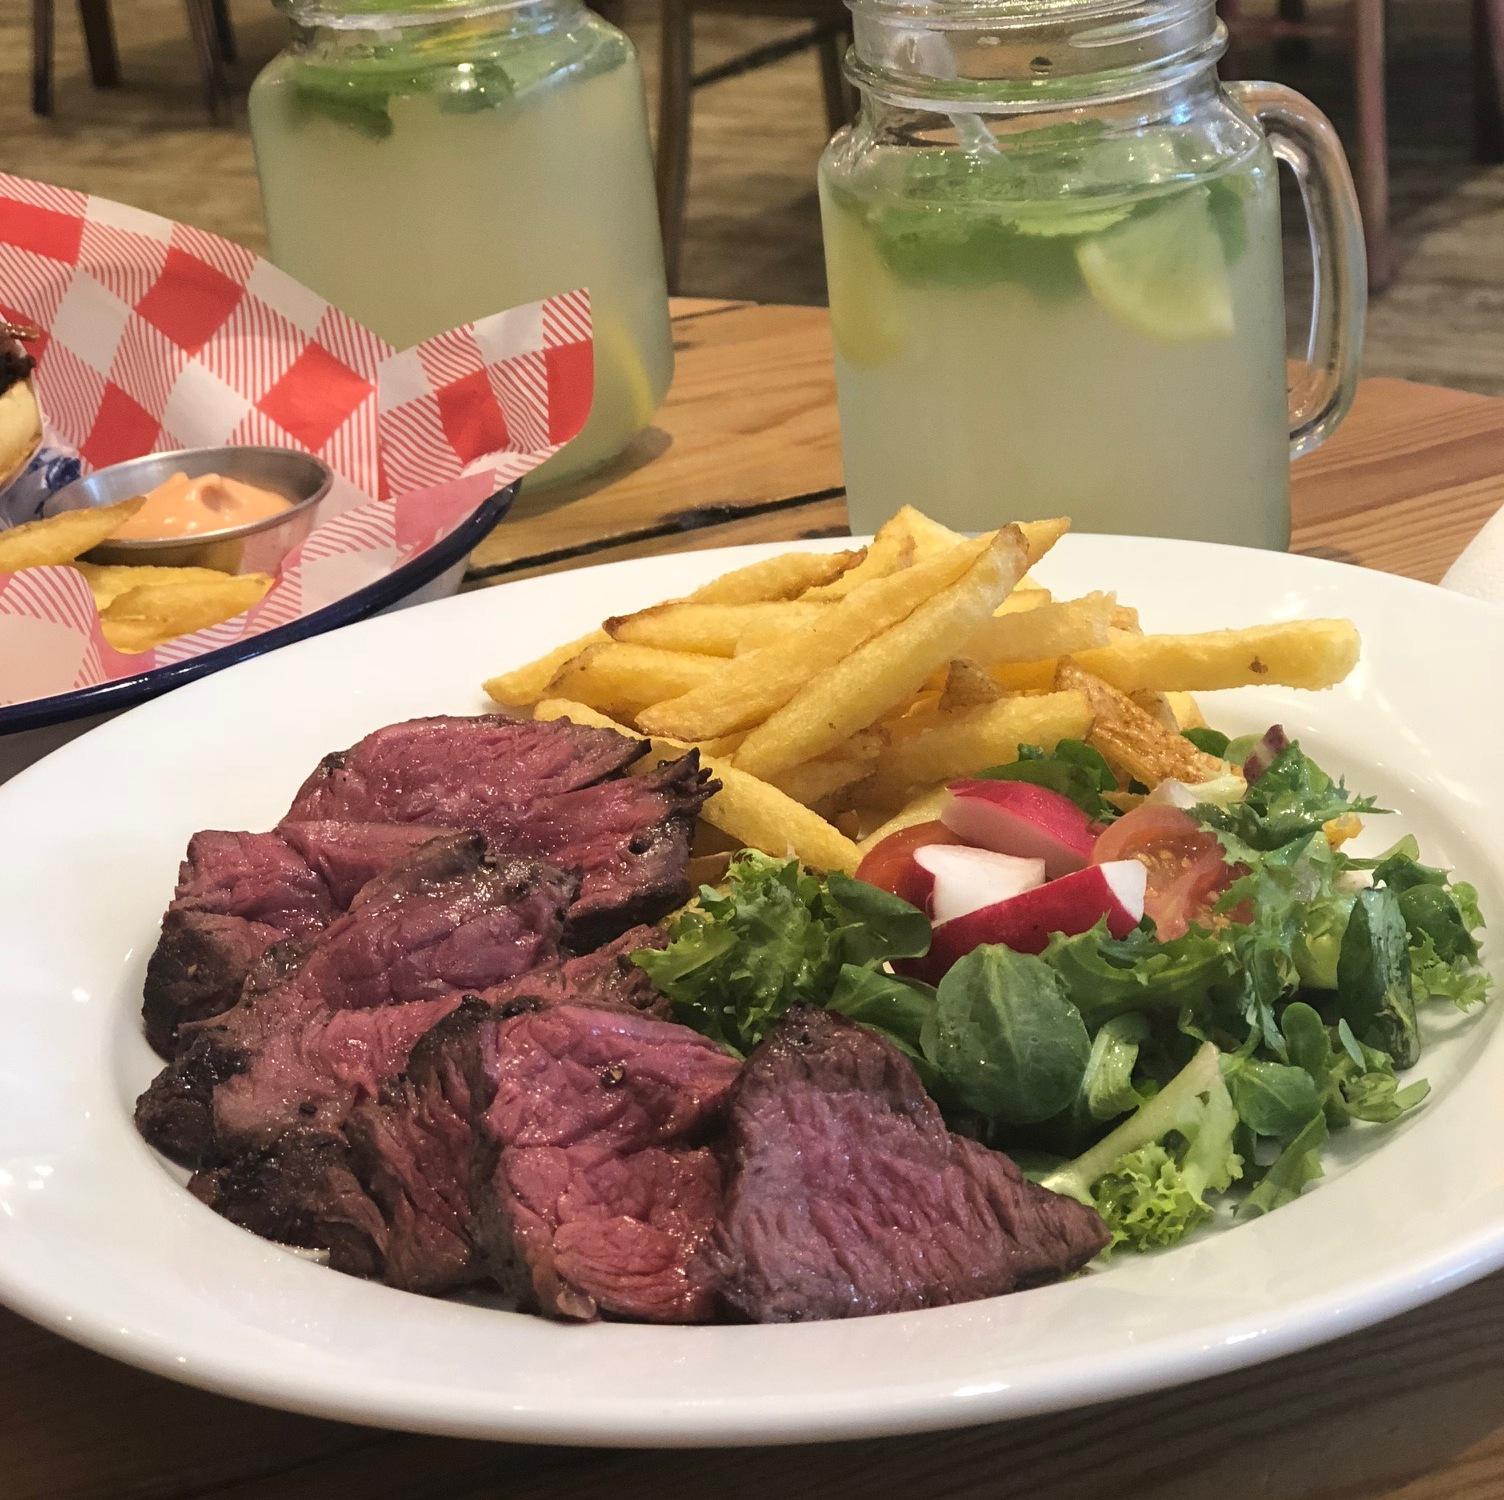 No Pork Halal Kitchen: Cristina's Casual Steakhouse